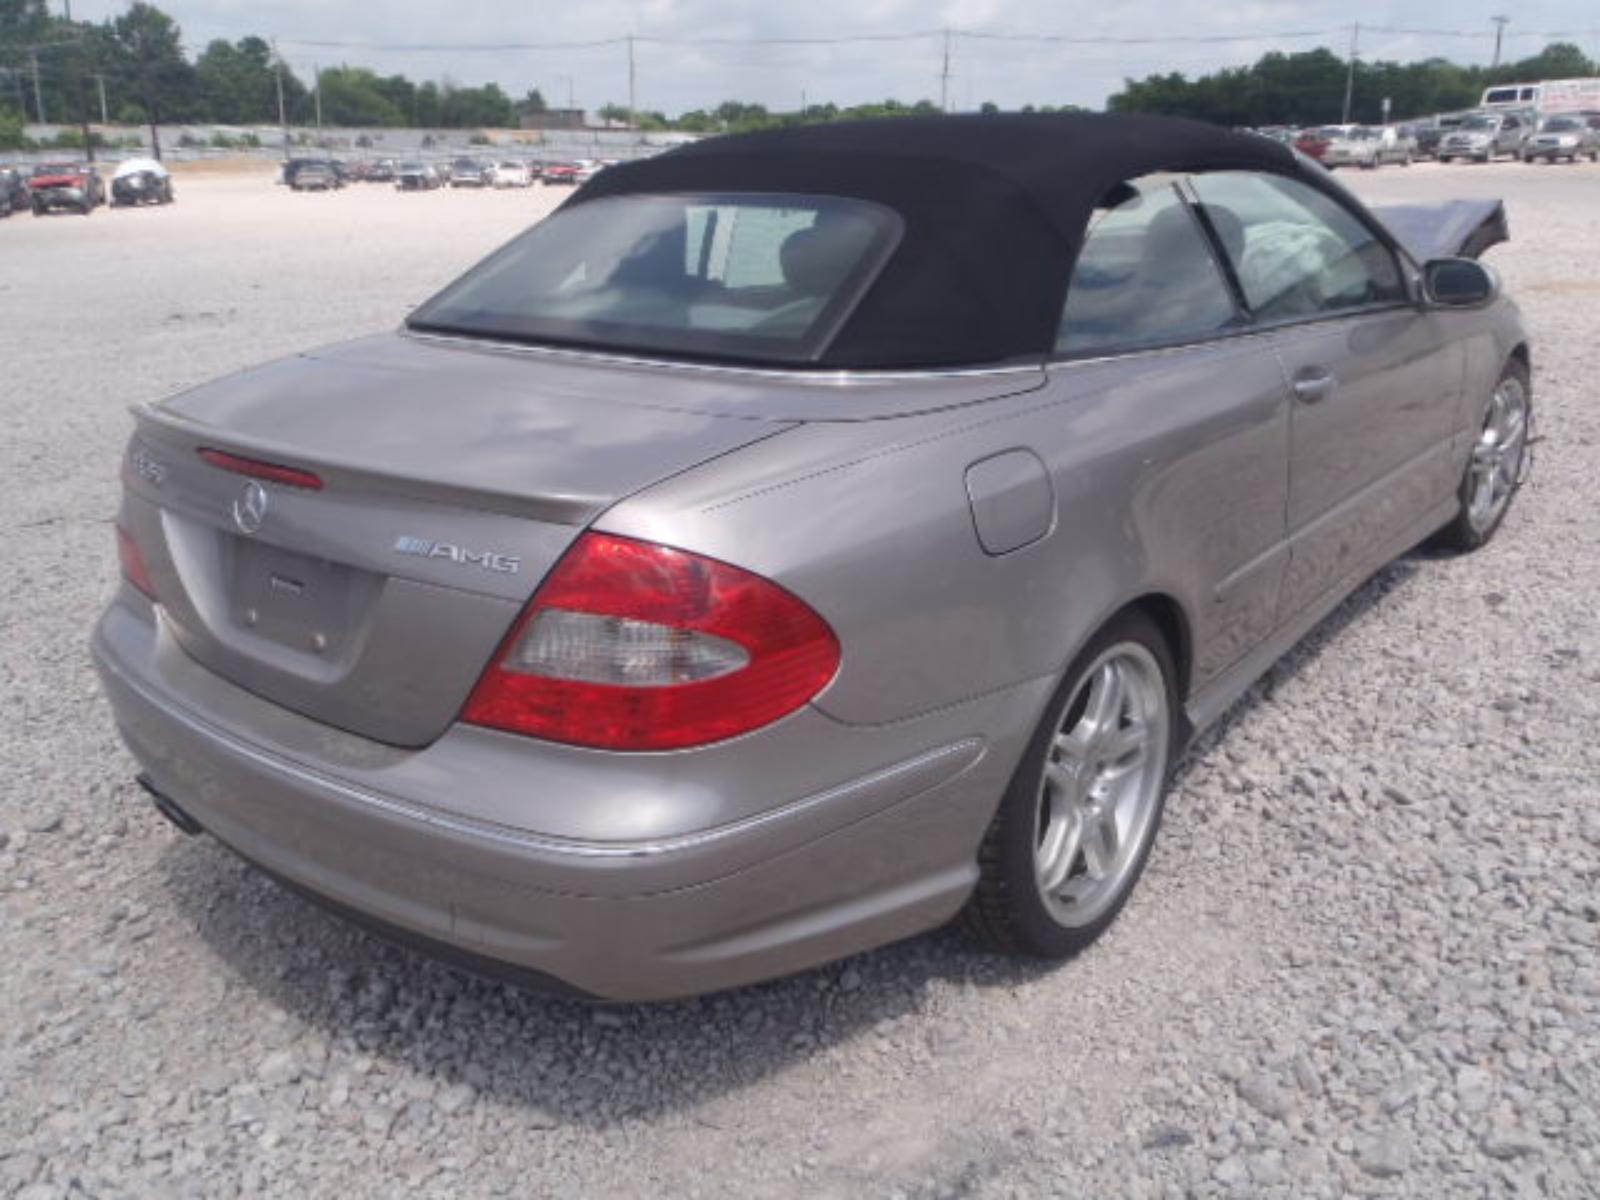 Mercedes Benz CLK Hood